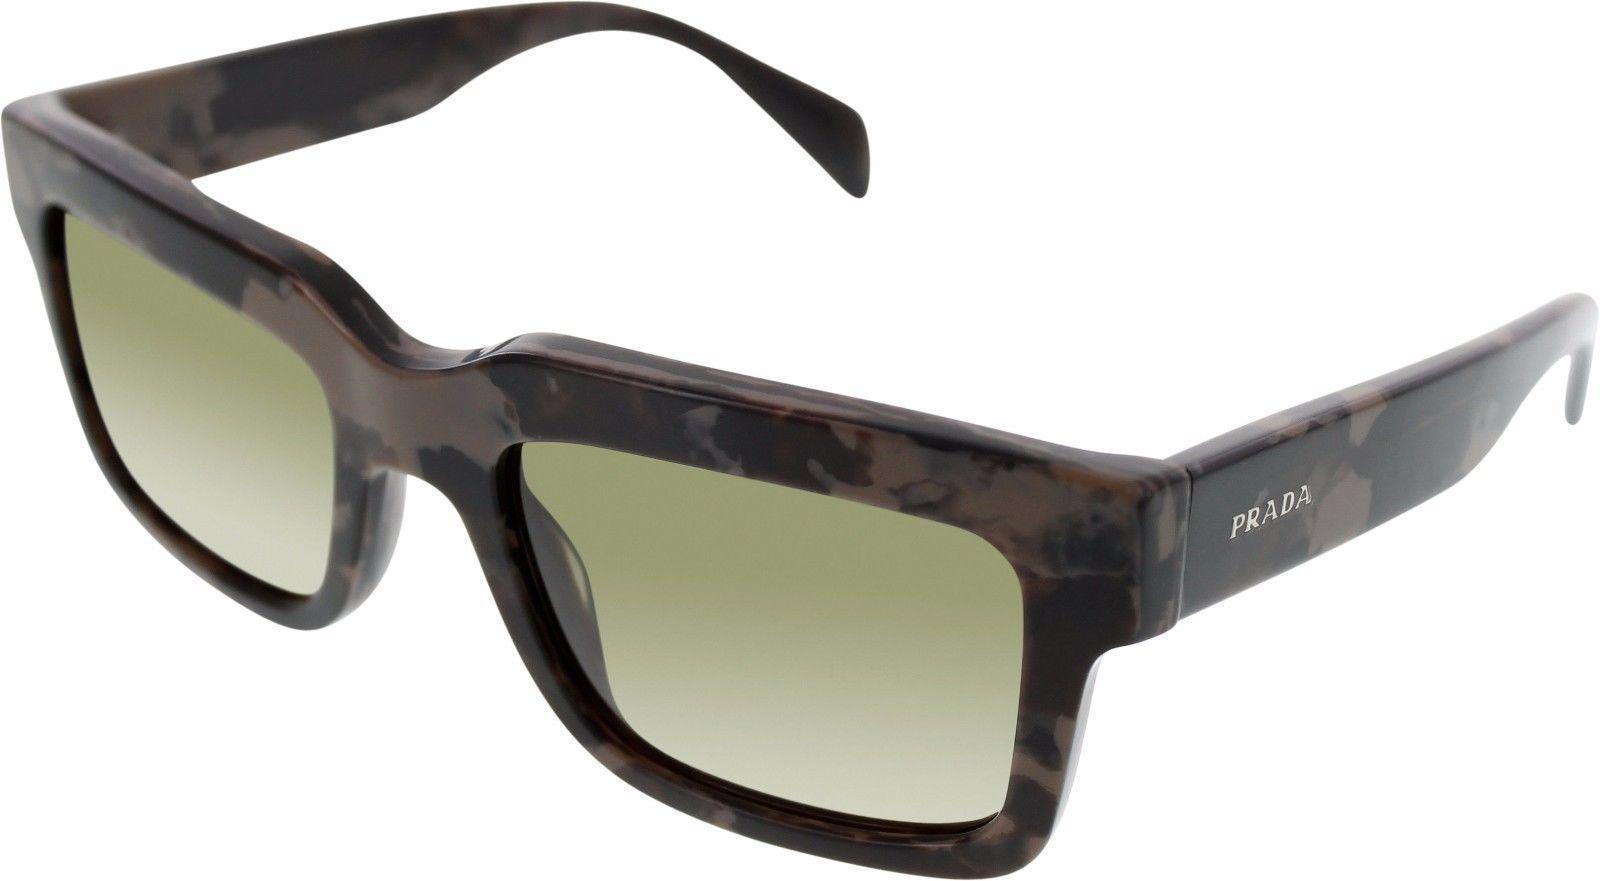 dd6c148f9019 Prada Sunglasses PR29PS ROI-1X1 52MM Mimetic and 50 similar items